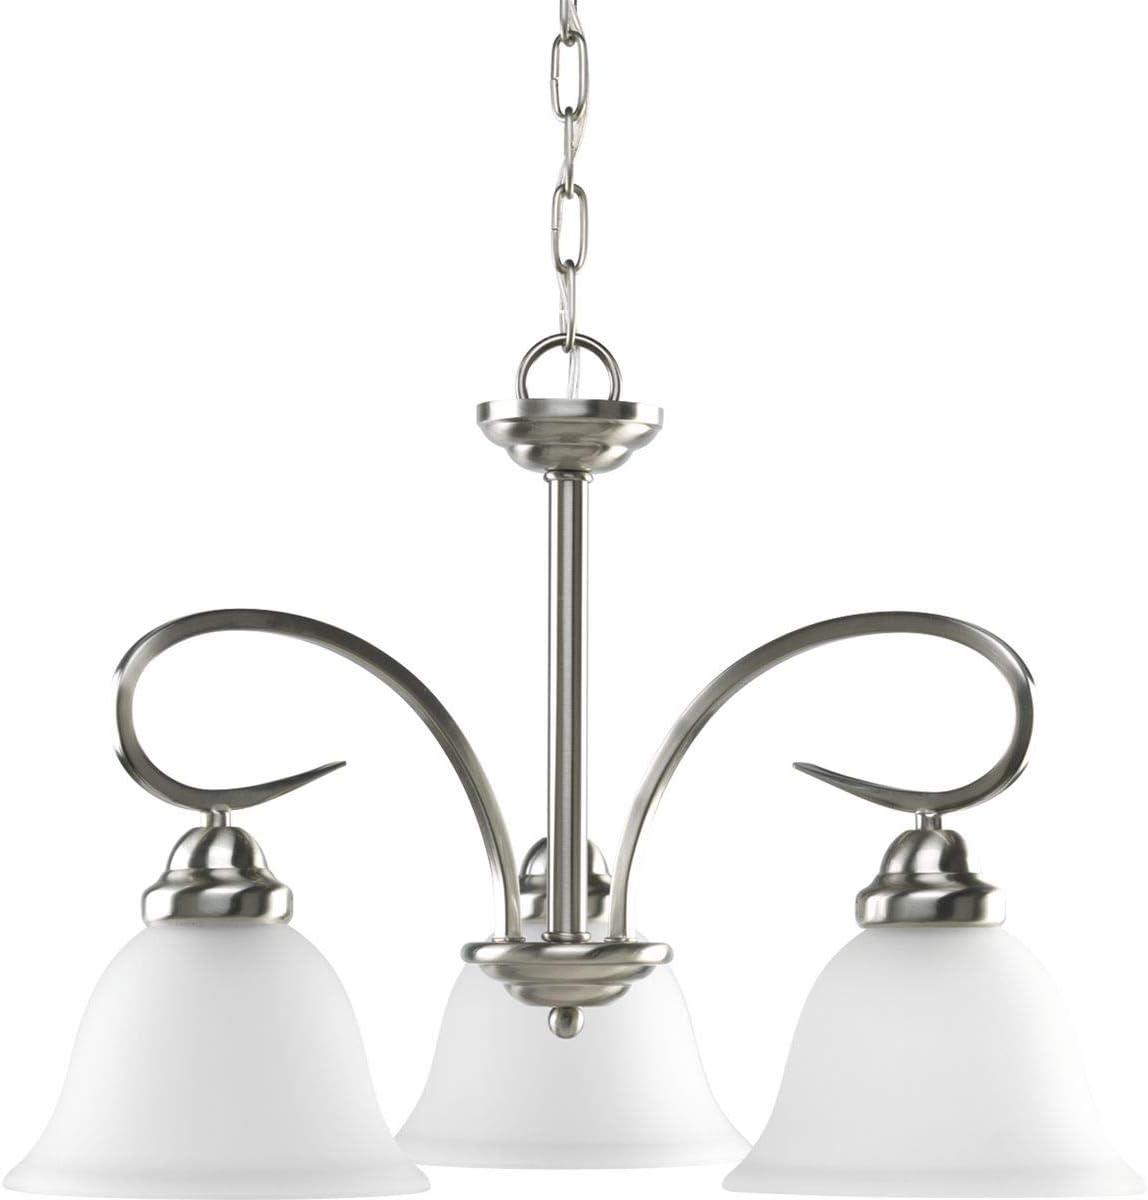 Laura Ashley Lighting PSY016 Selby 16-Inch Pendant, Satin Nickel